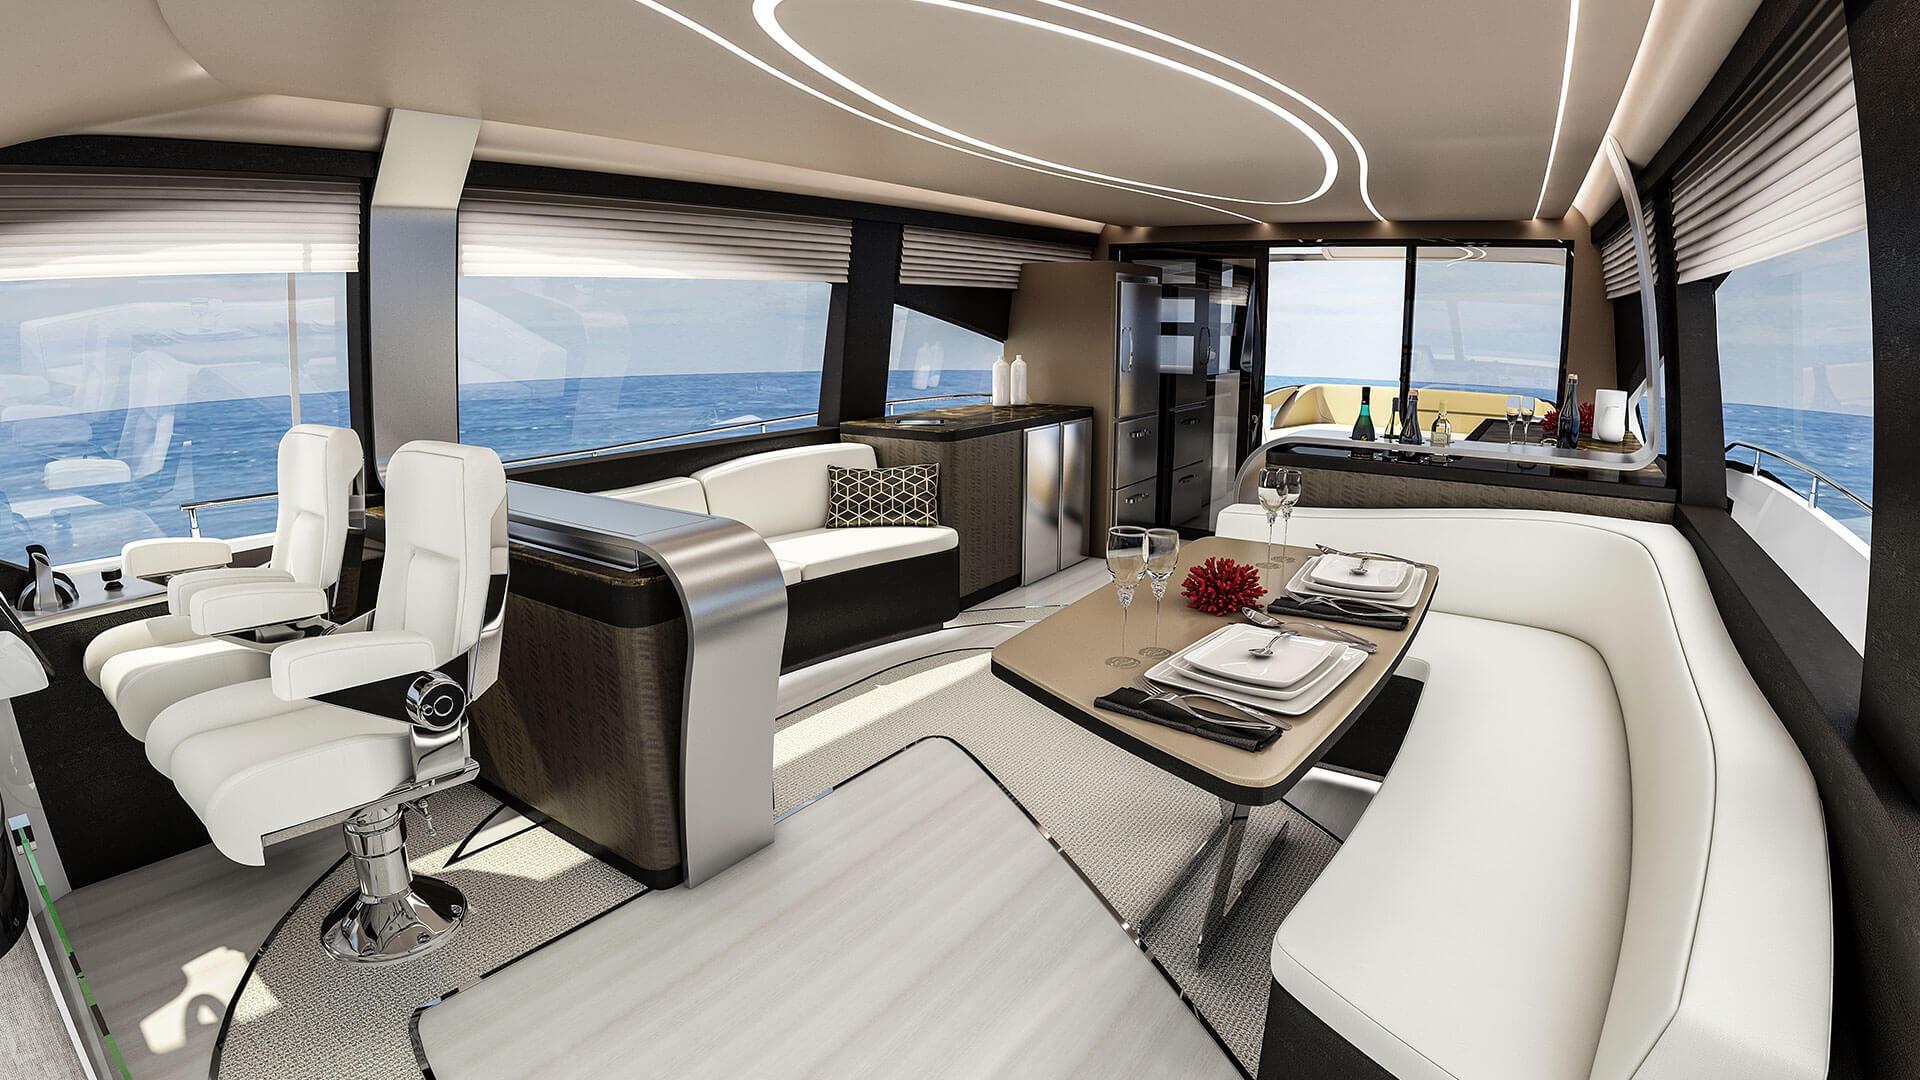 2019 lexus ly 650 luxury yacht gallery 01